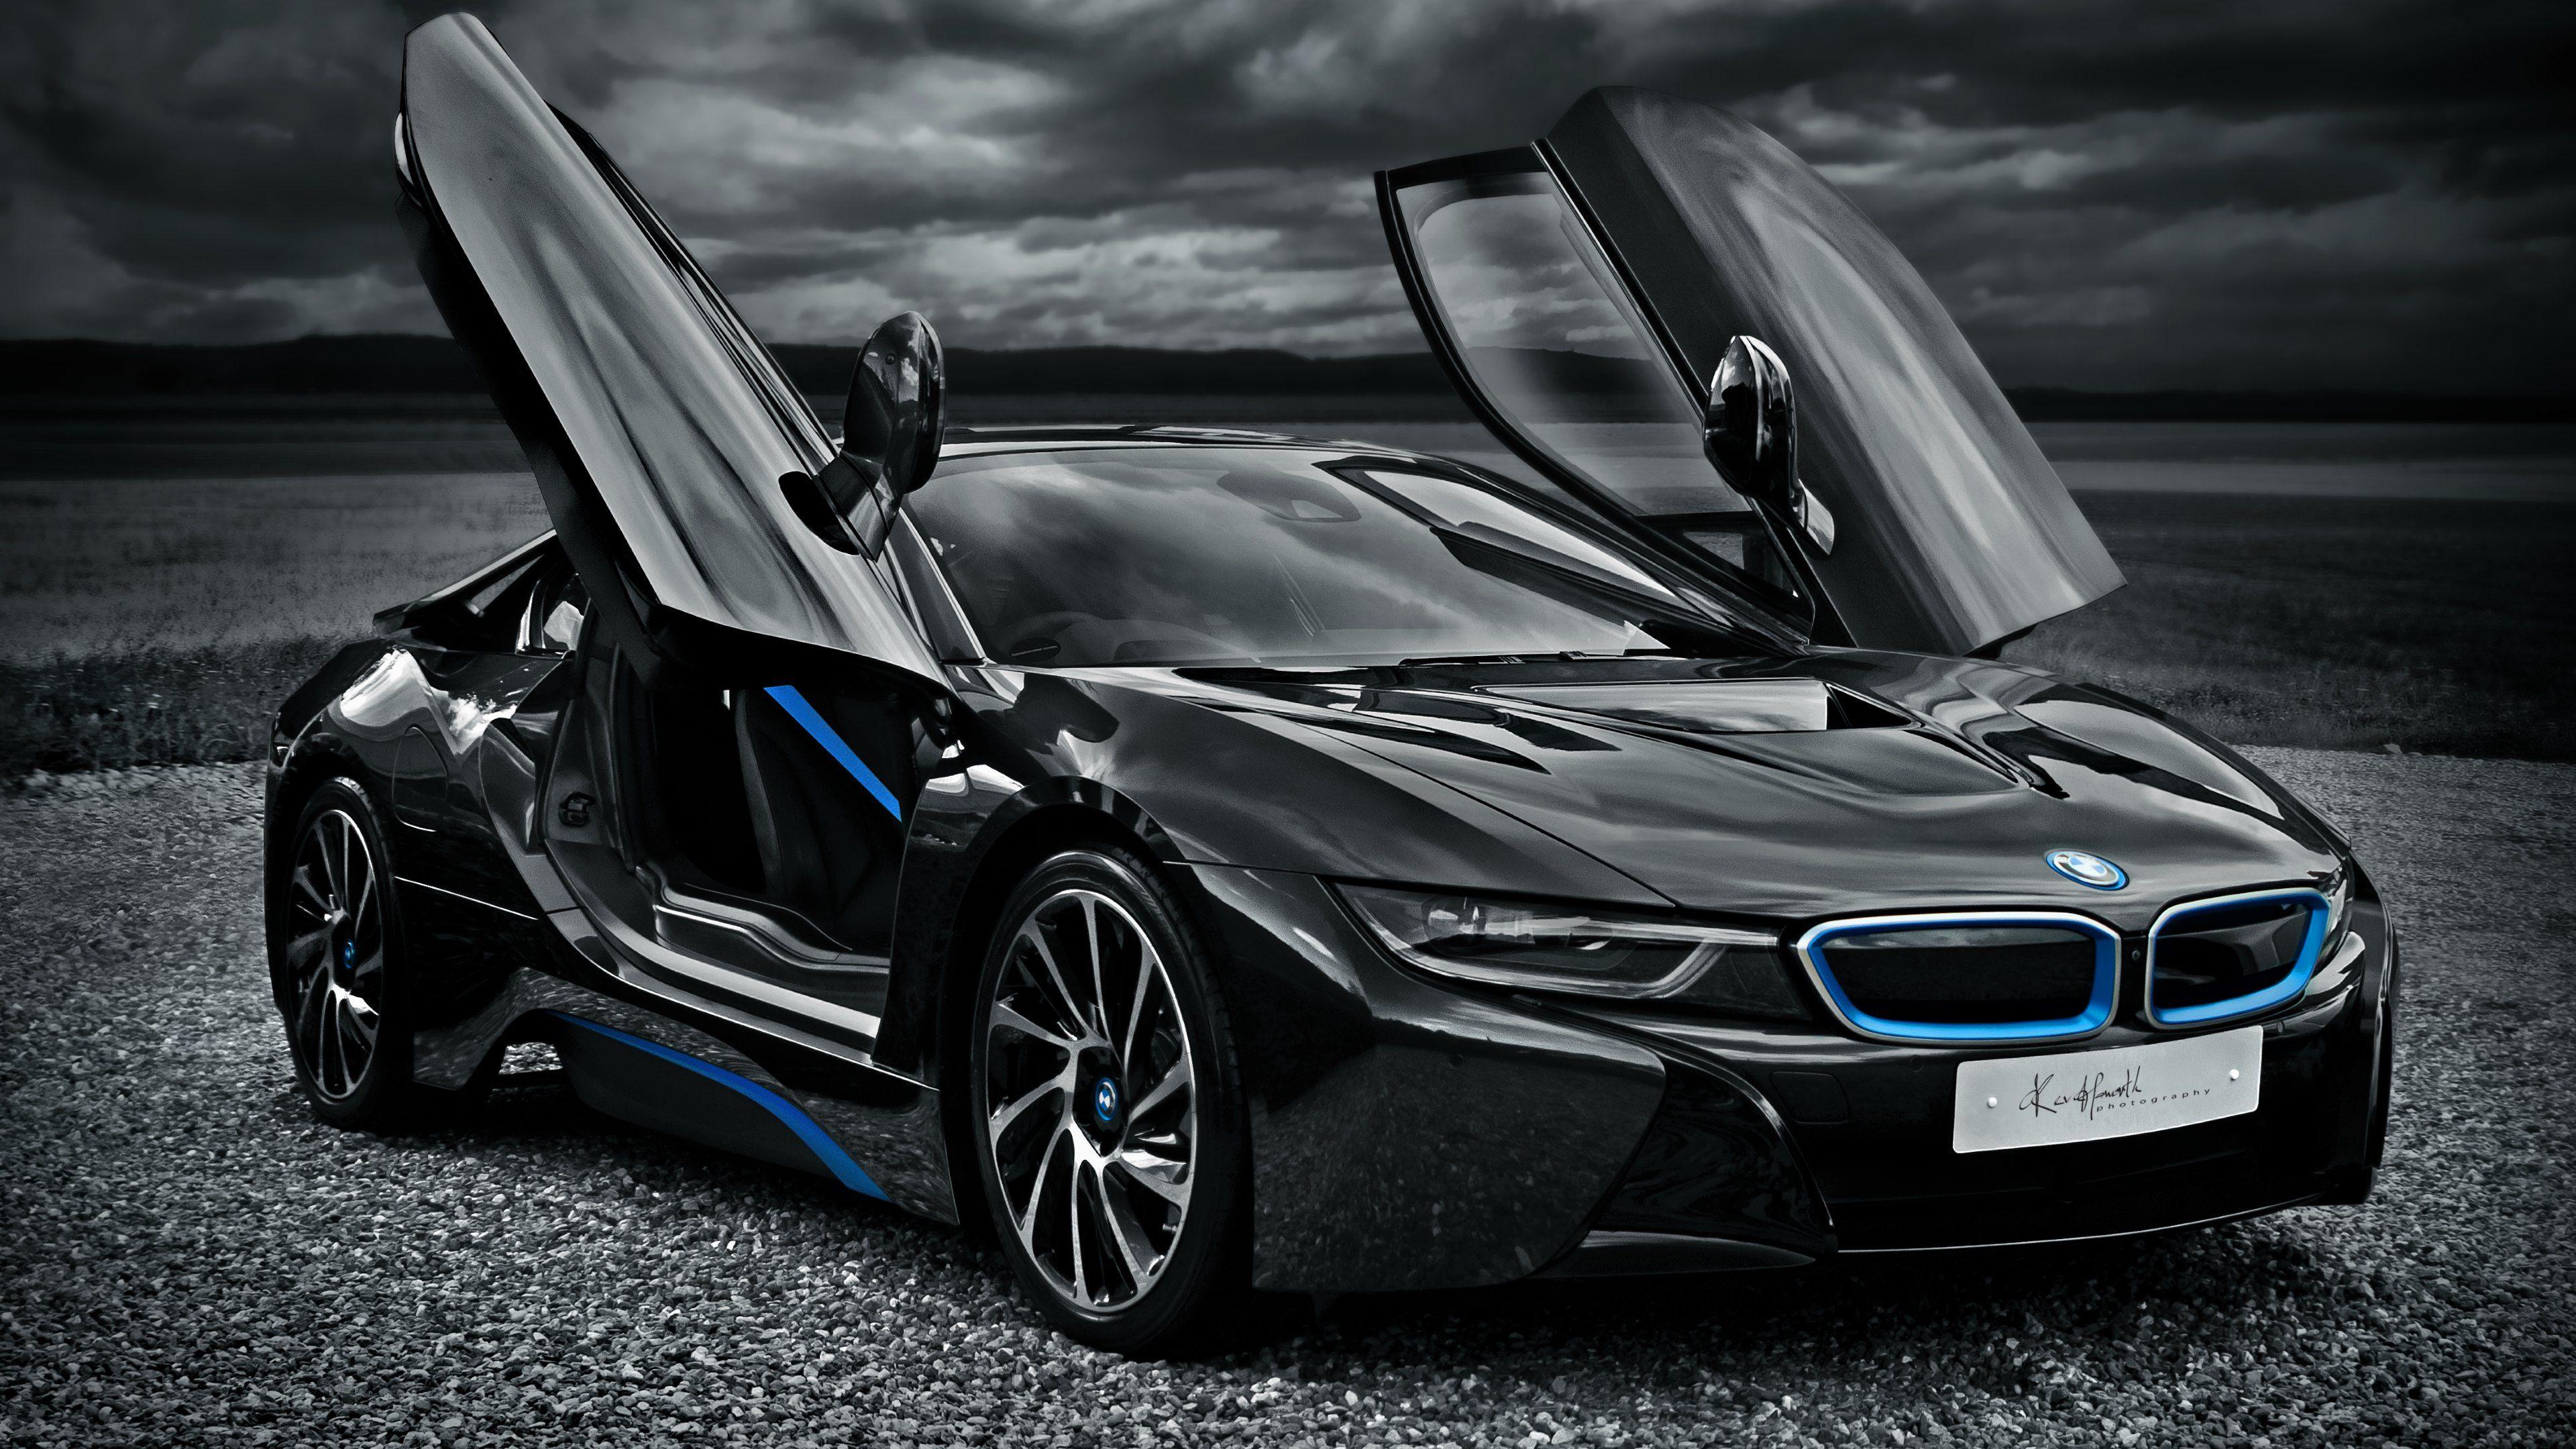 BMW i8 Ultra HD 4K Wallpapers Cars Pinterest Cars